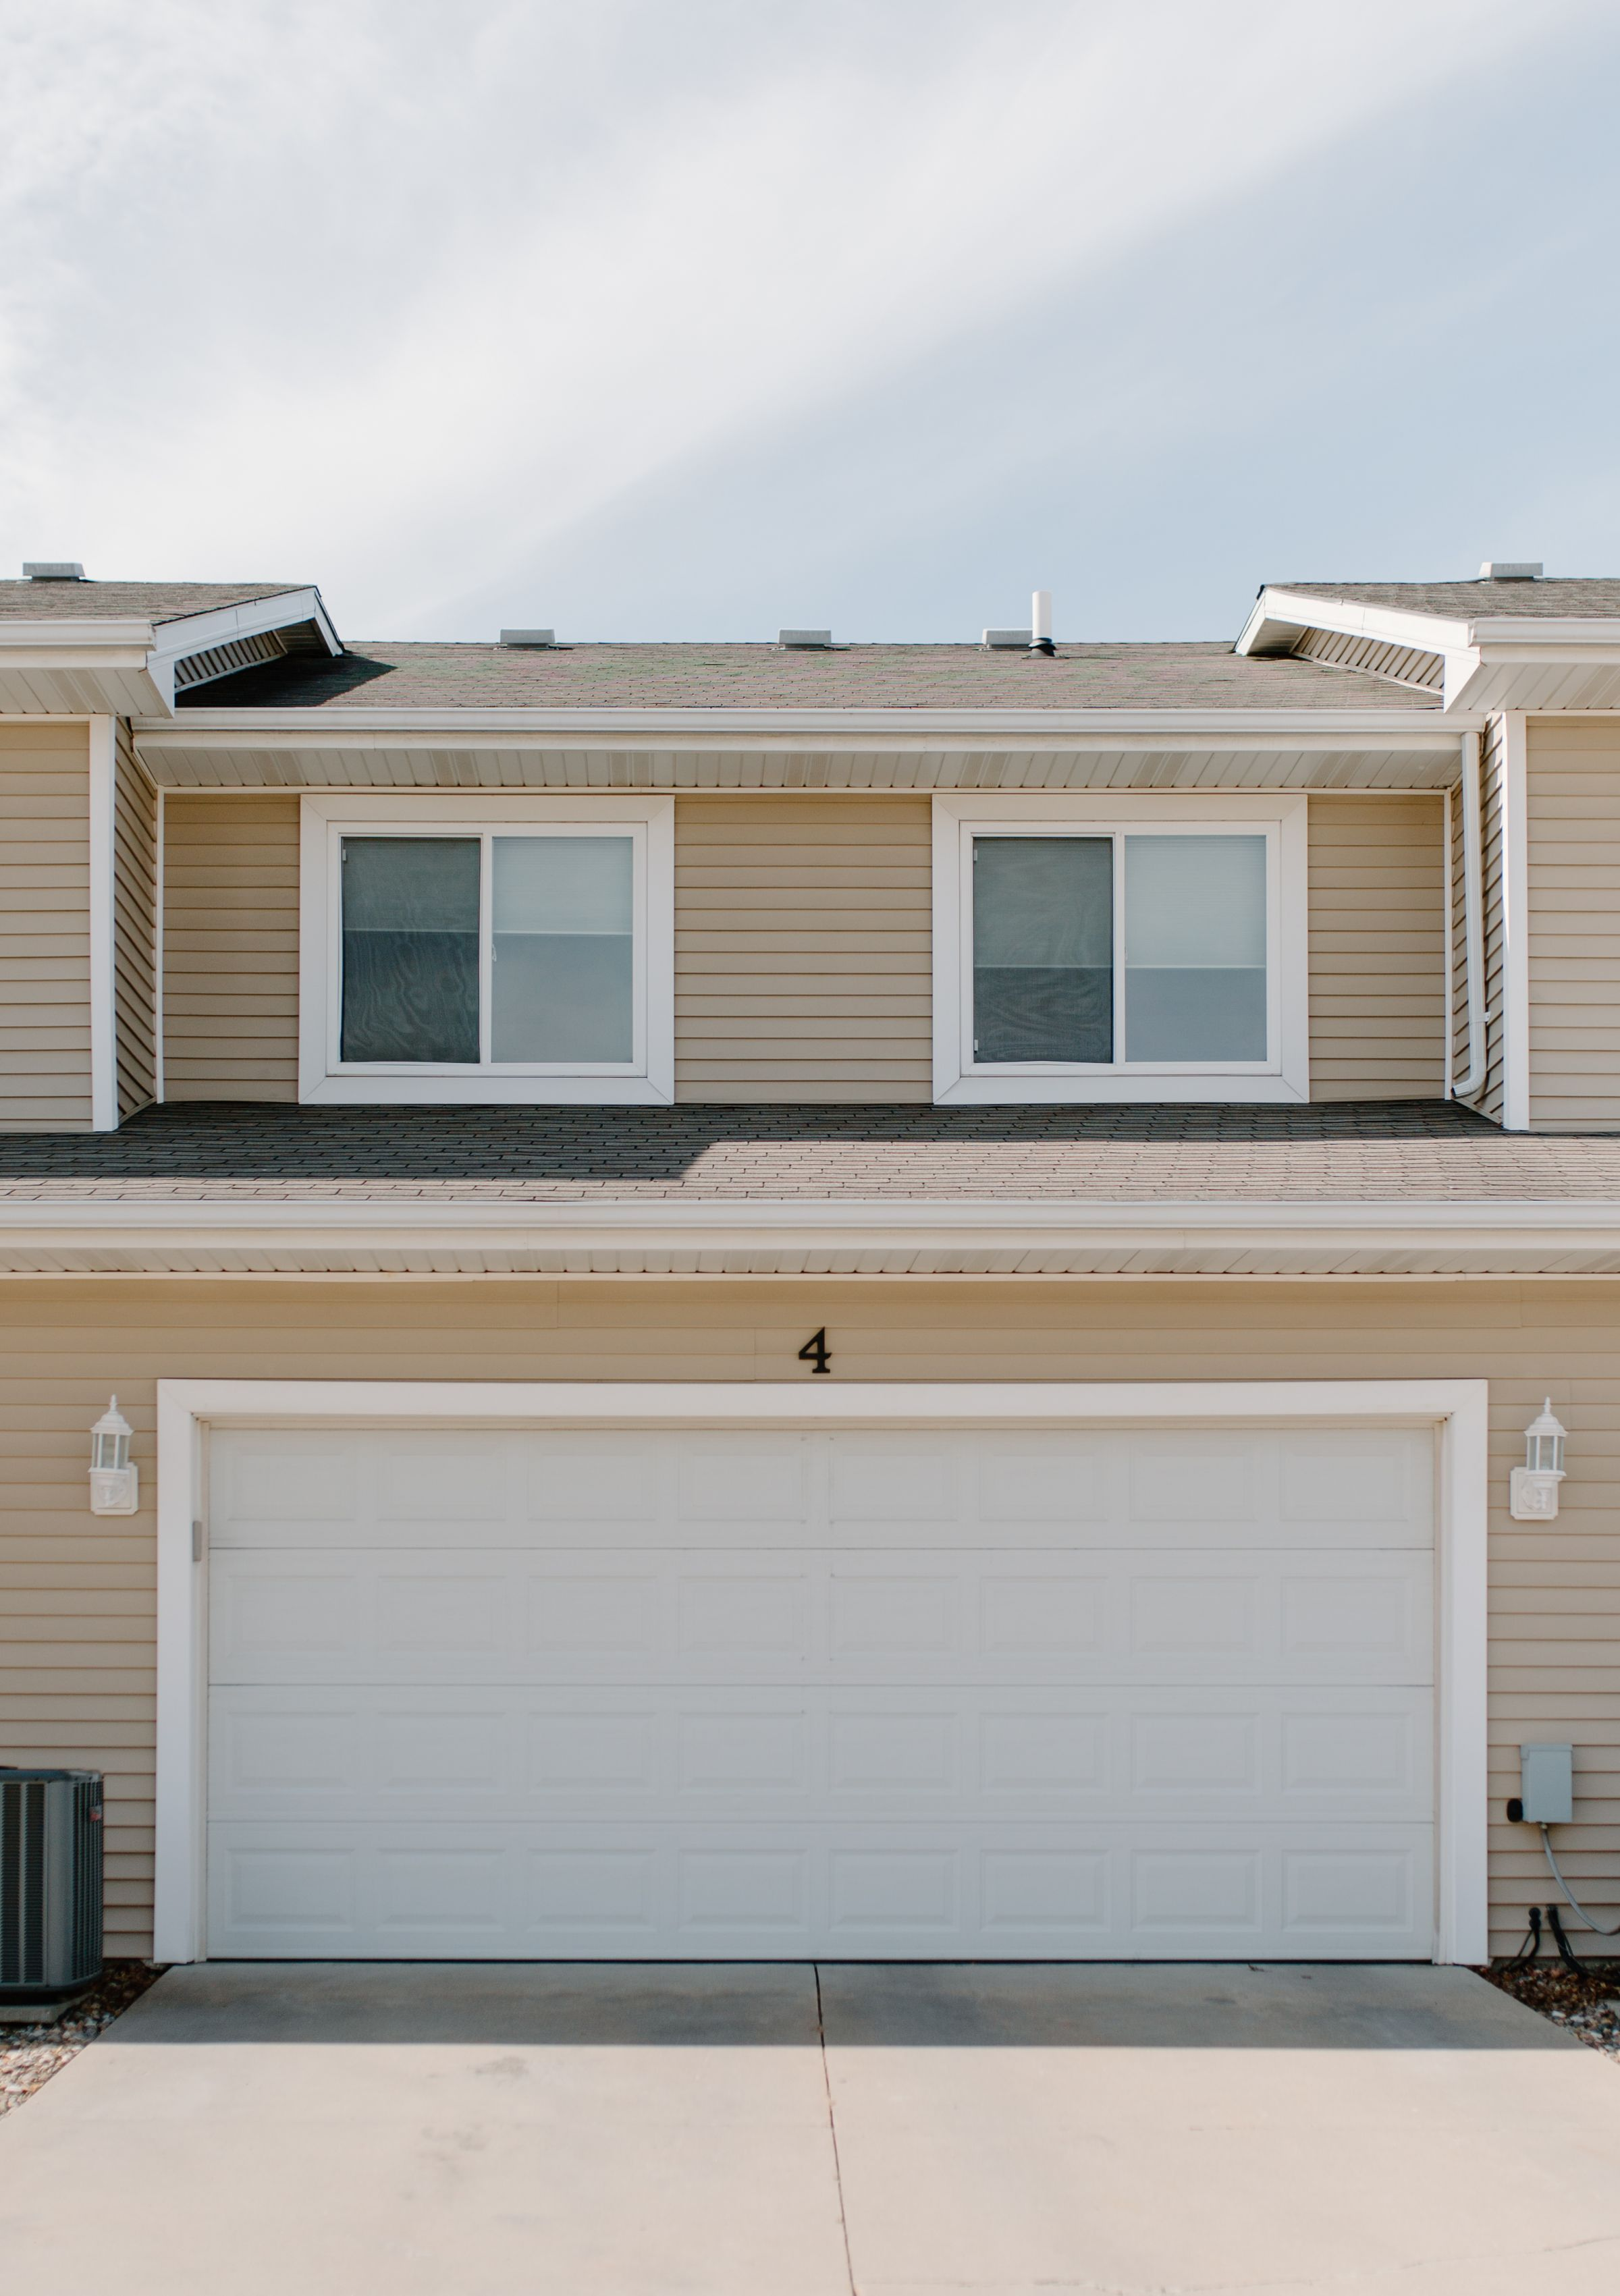 residential-polk-county-iowa-0-acres-listing-number-15418-1-2021-03-22-162125.jpg